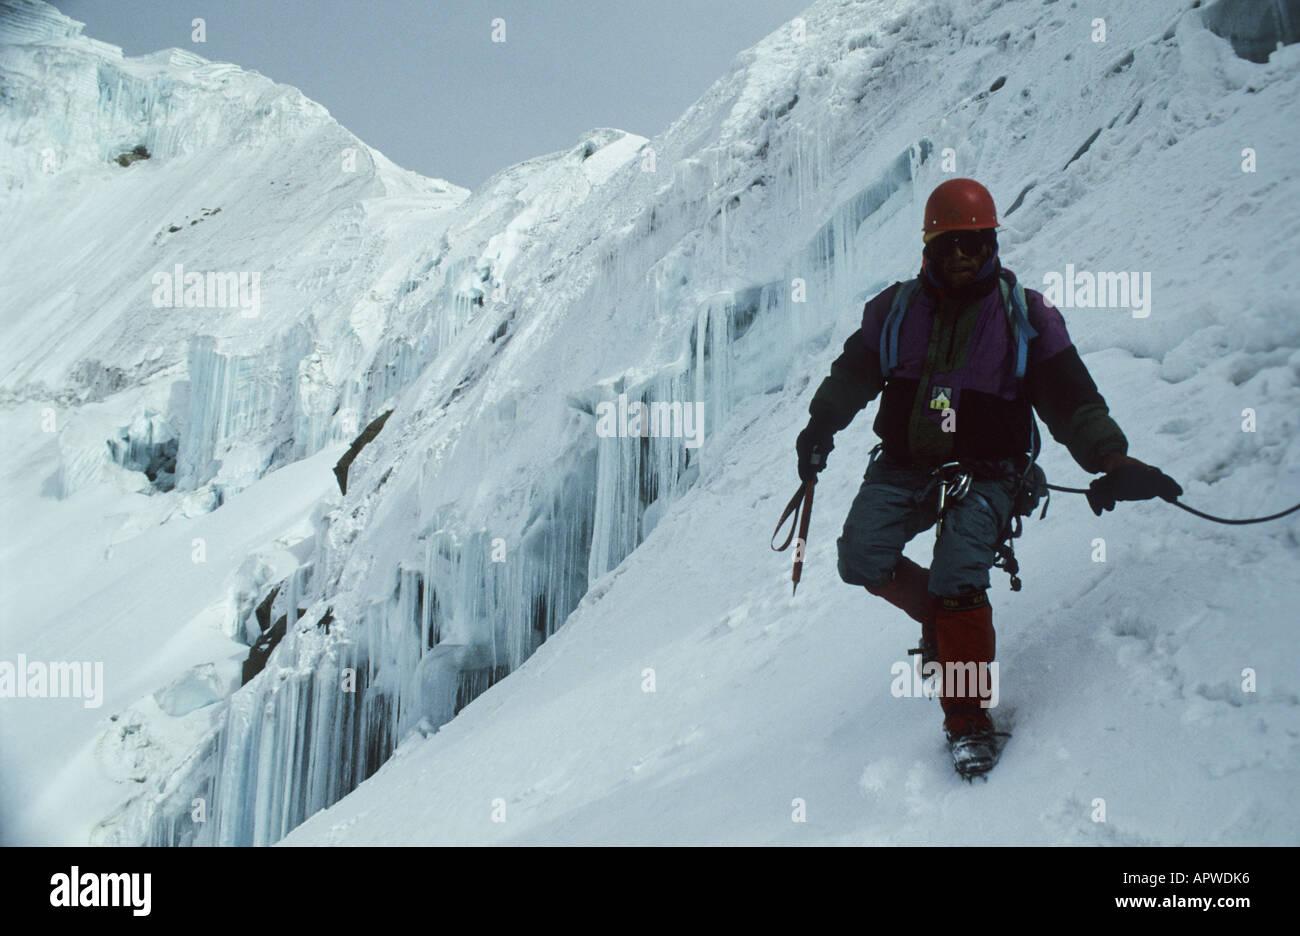 Alpinist descending the 6088 m high Huyana Potosi from the top, 25 km north of La Paz, Bolivia. - Stock Image